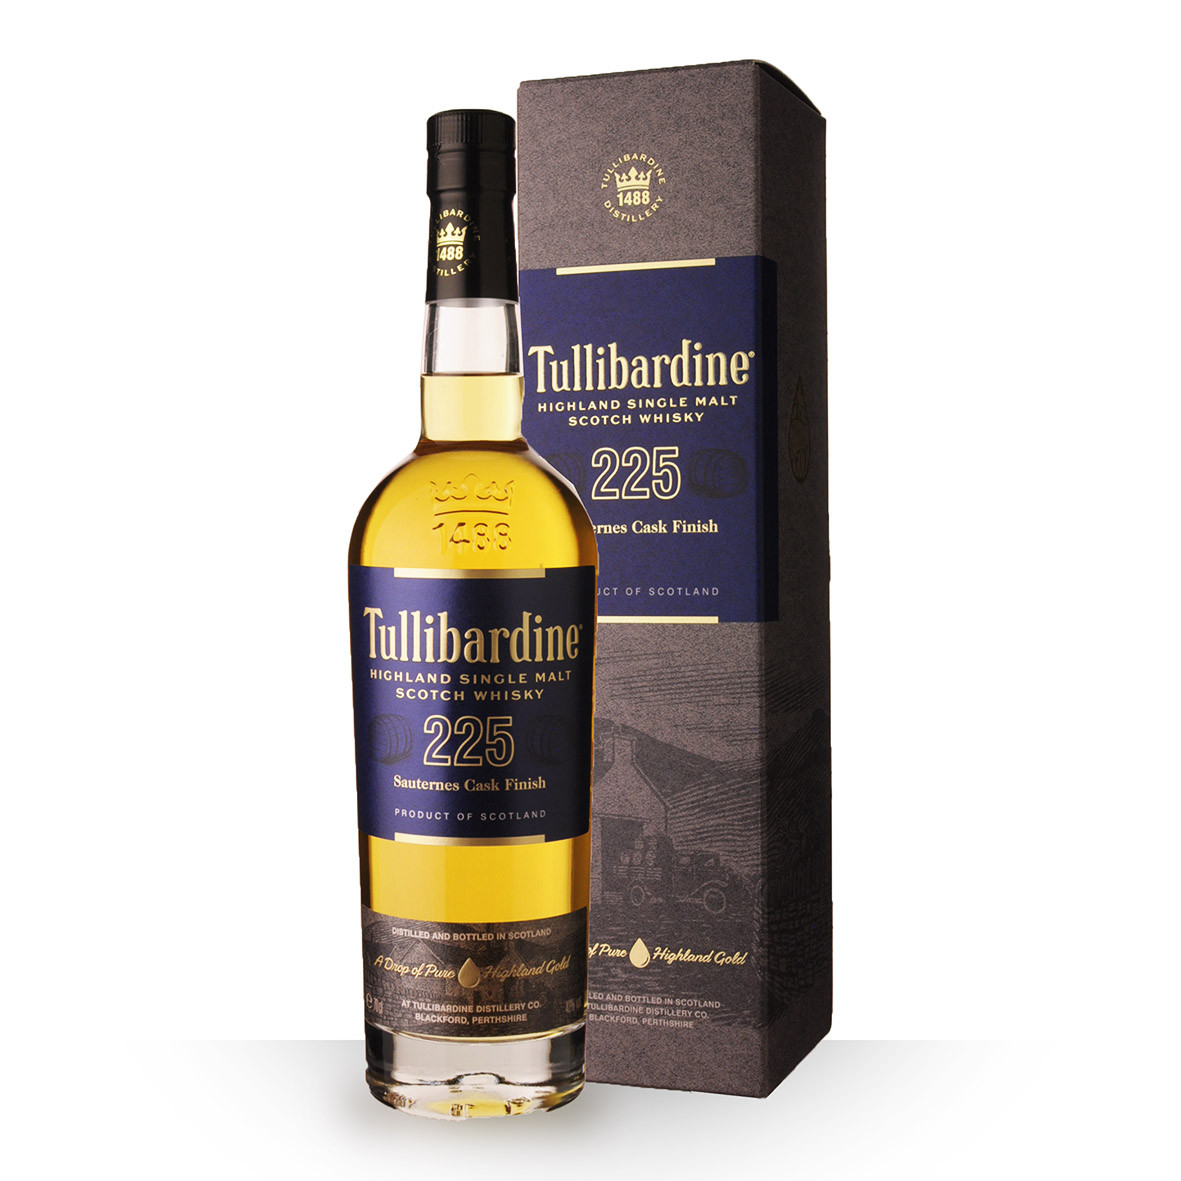 Whisky Tullibardine 225 Sauternes Finish 70cl Coffret www.odyssee-vins.com